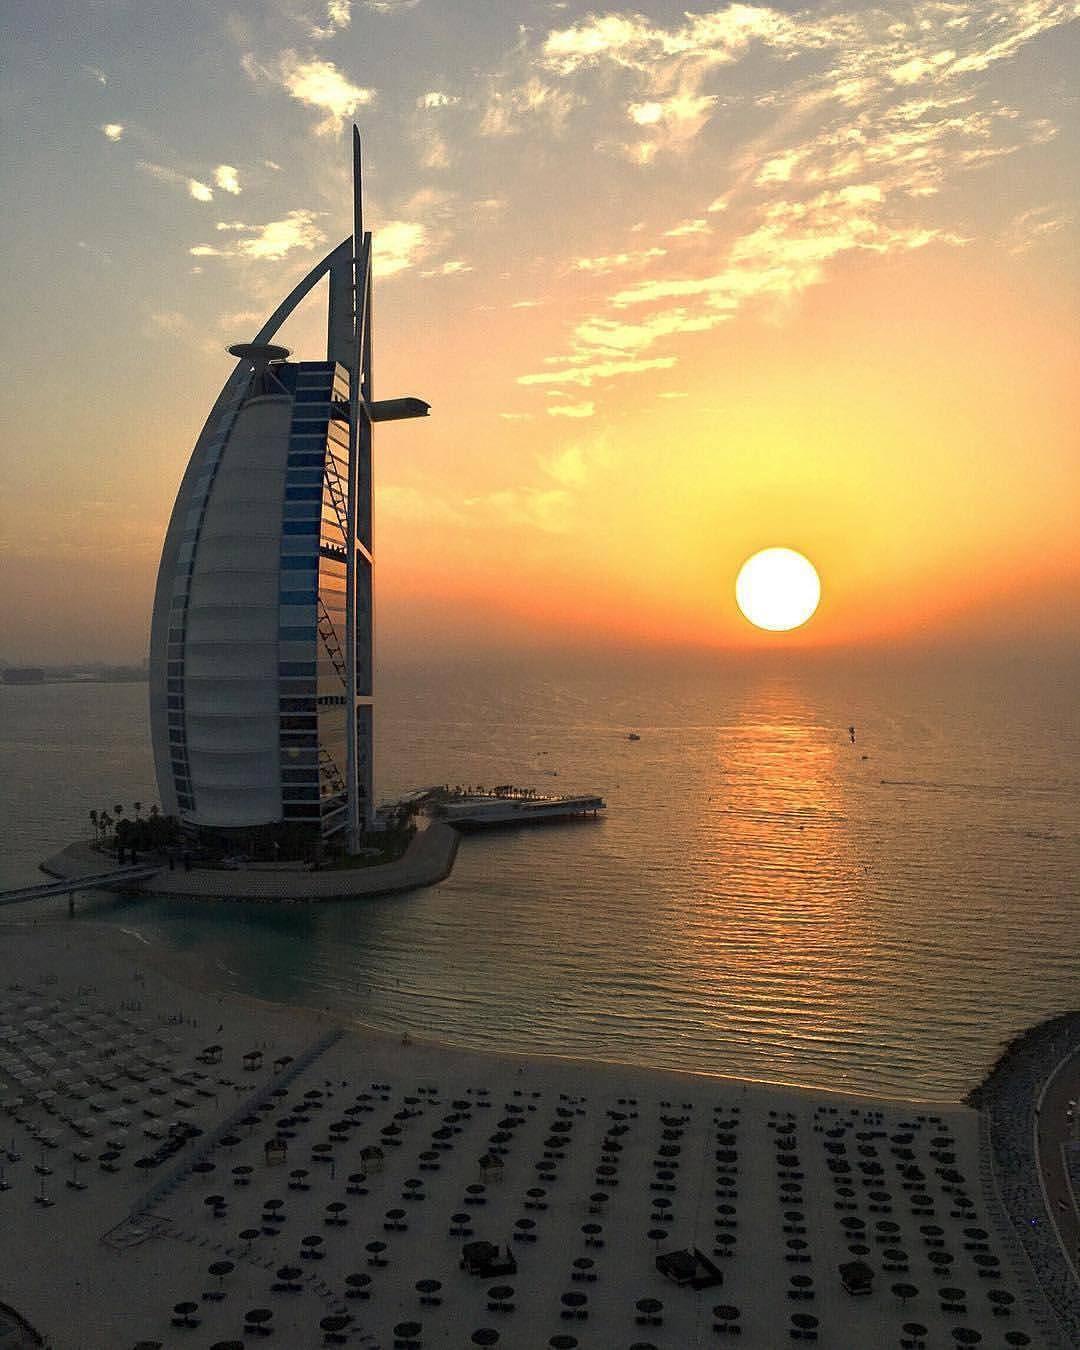 "Dubai Official UAE (@dubaiofficialuae) on Instagram: ""Photo by @dubai.uae.dxb"""